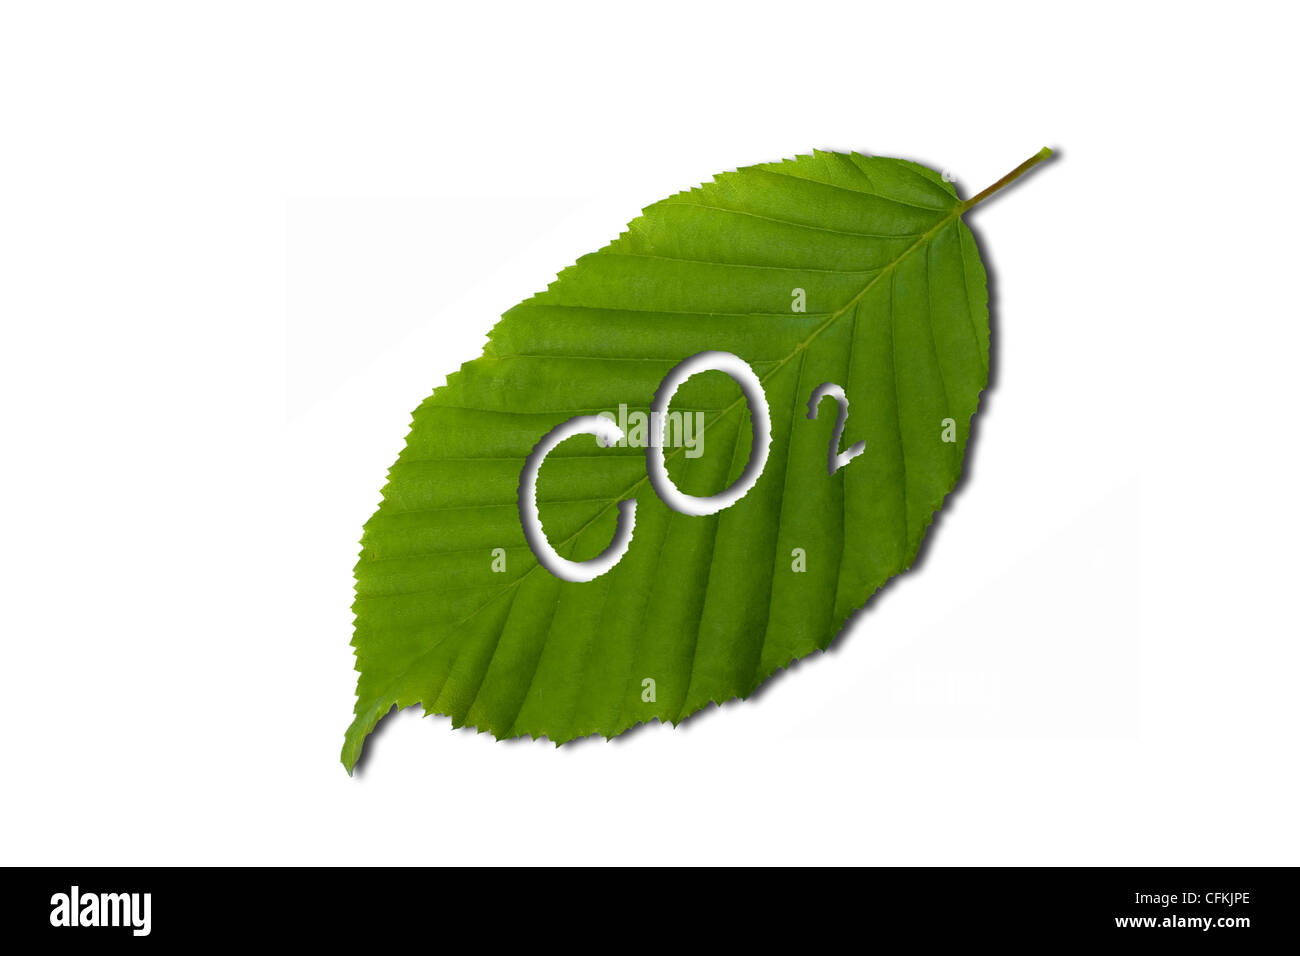 Dióxido de carbono Imagen De Stock